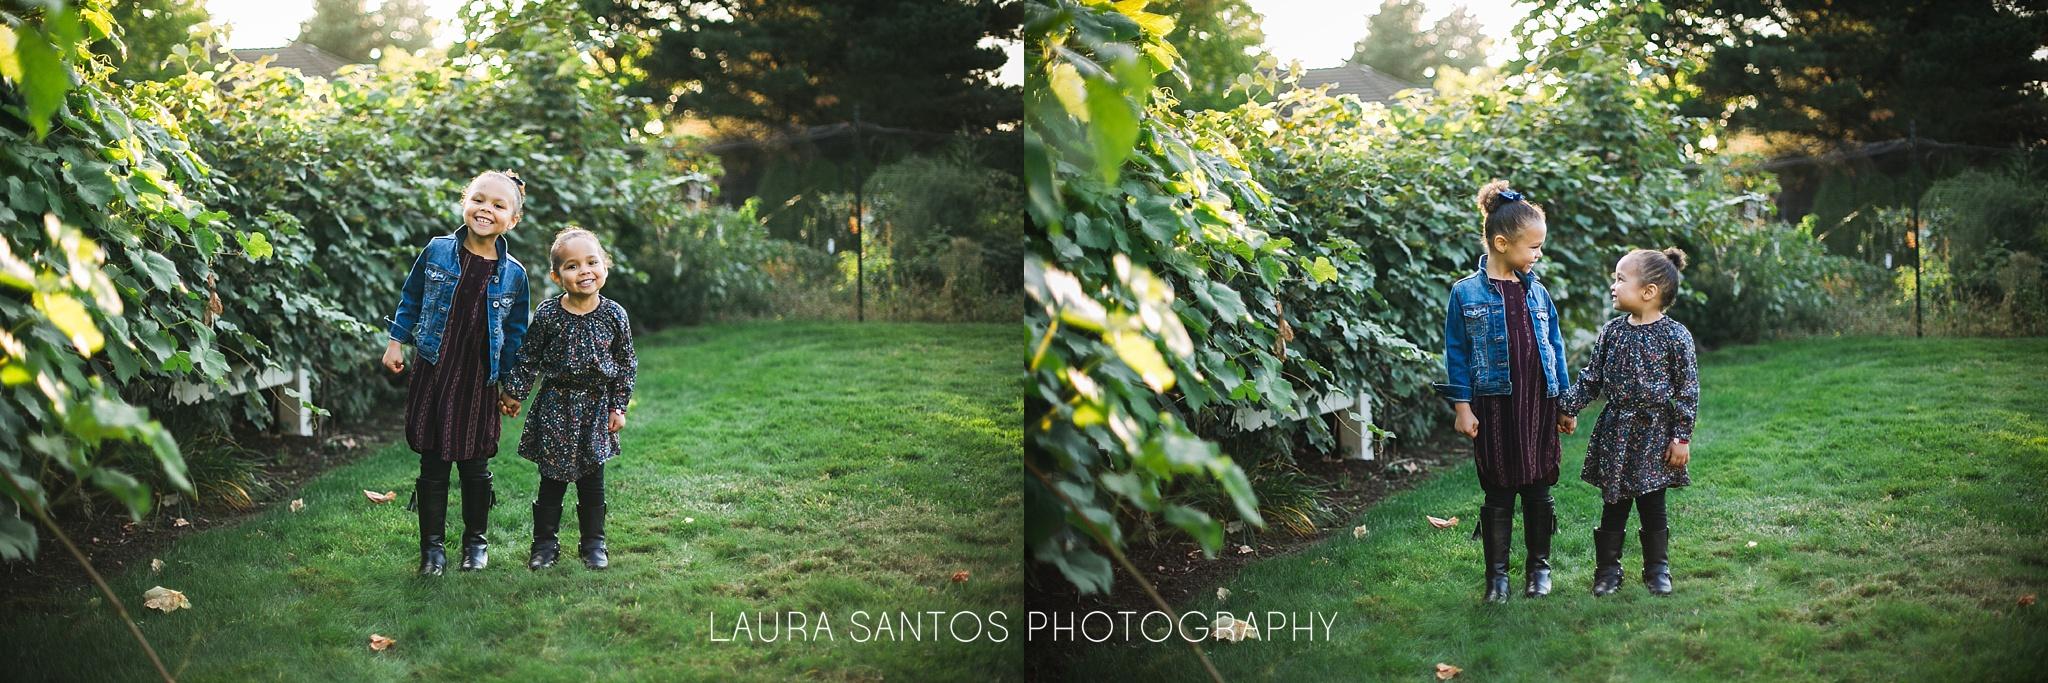 Portland OR Family Photograher Laura Santos Photography_0221.jpg